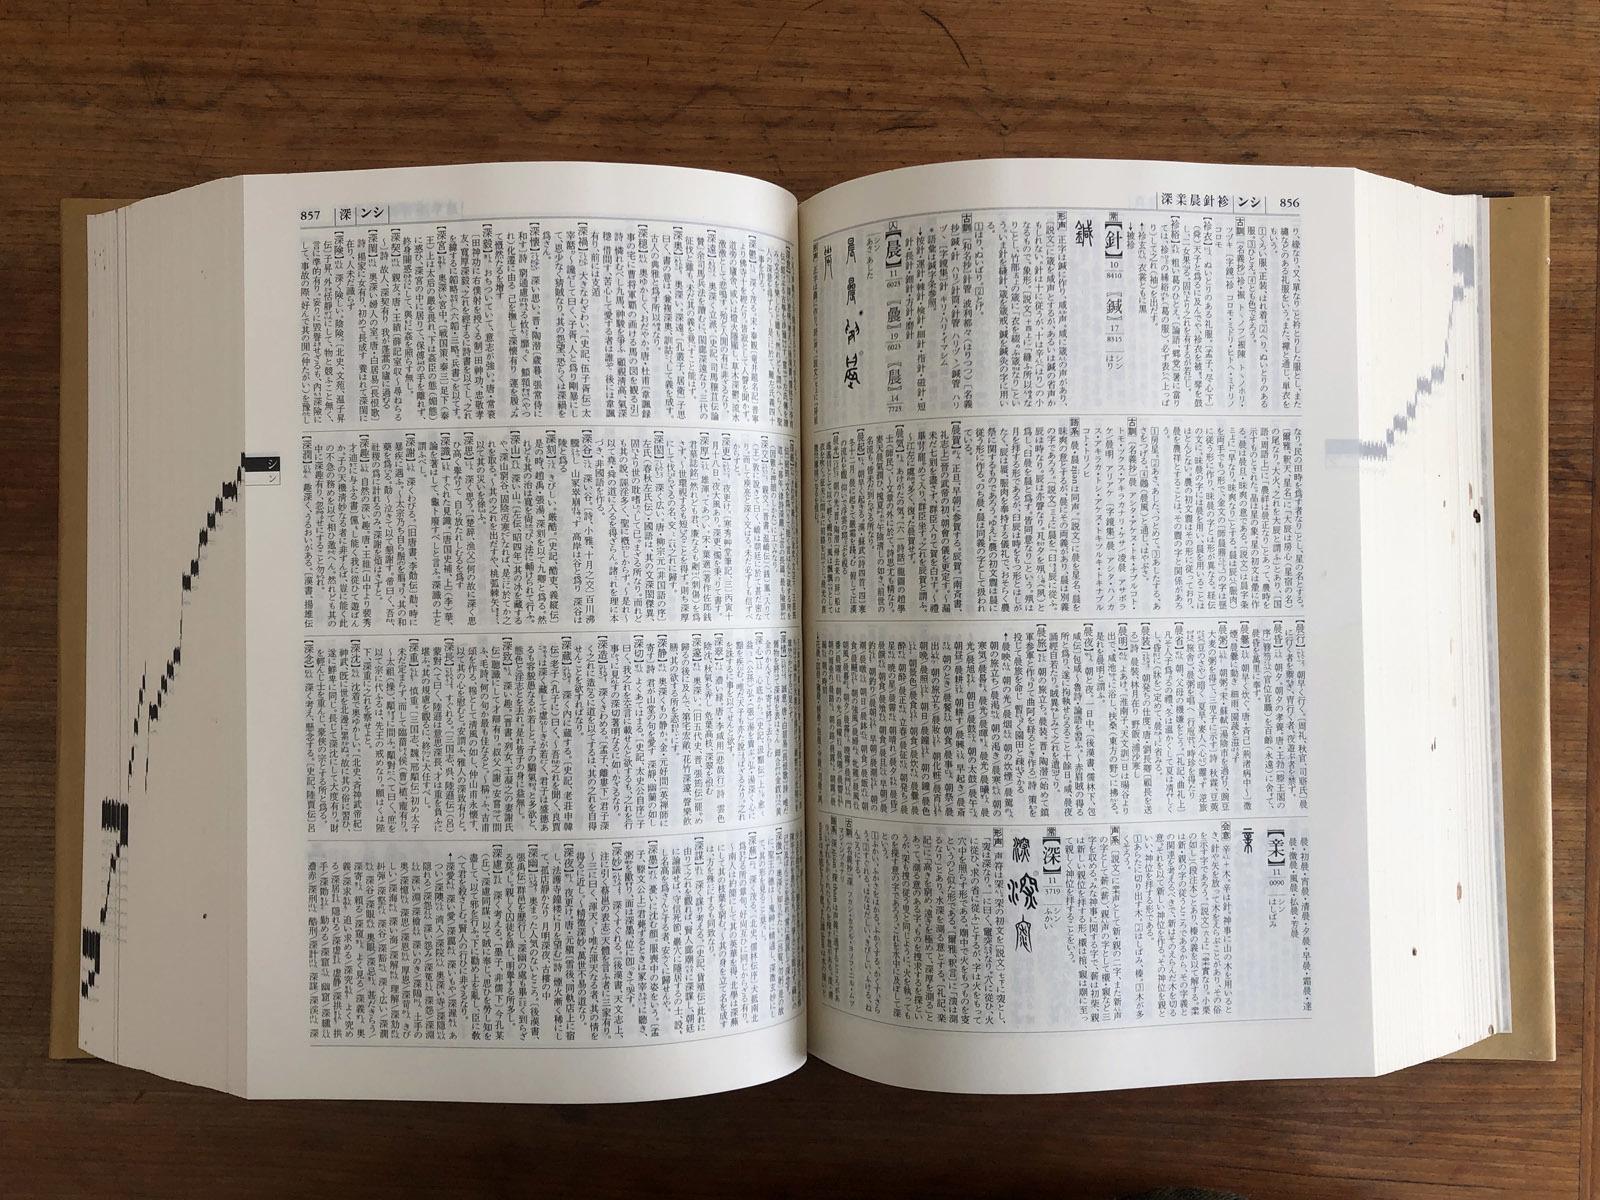 字典と専門書_e0367501_15164040.jpg